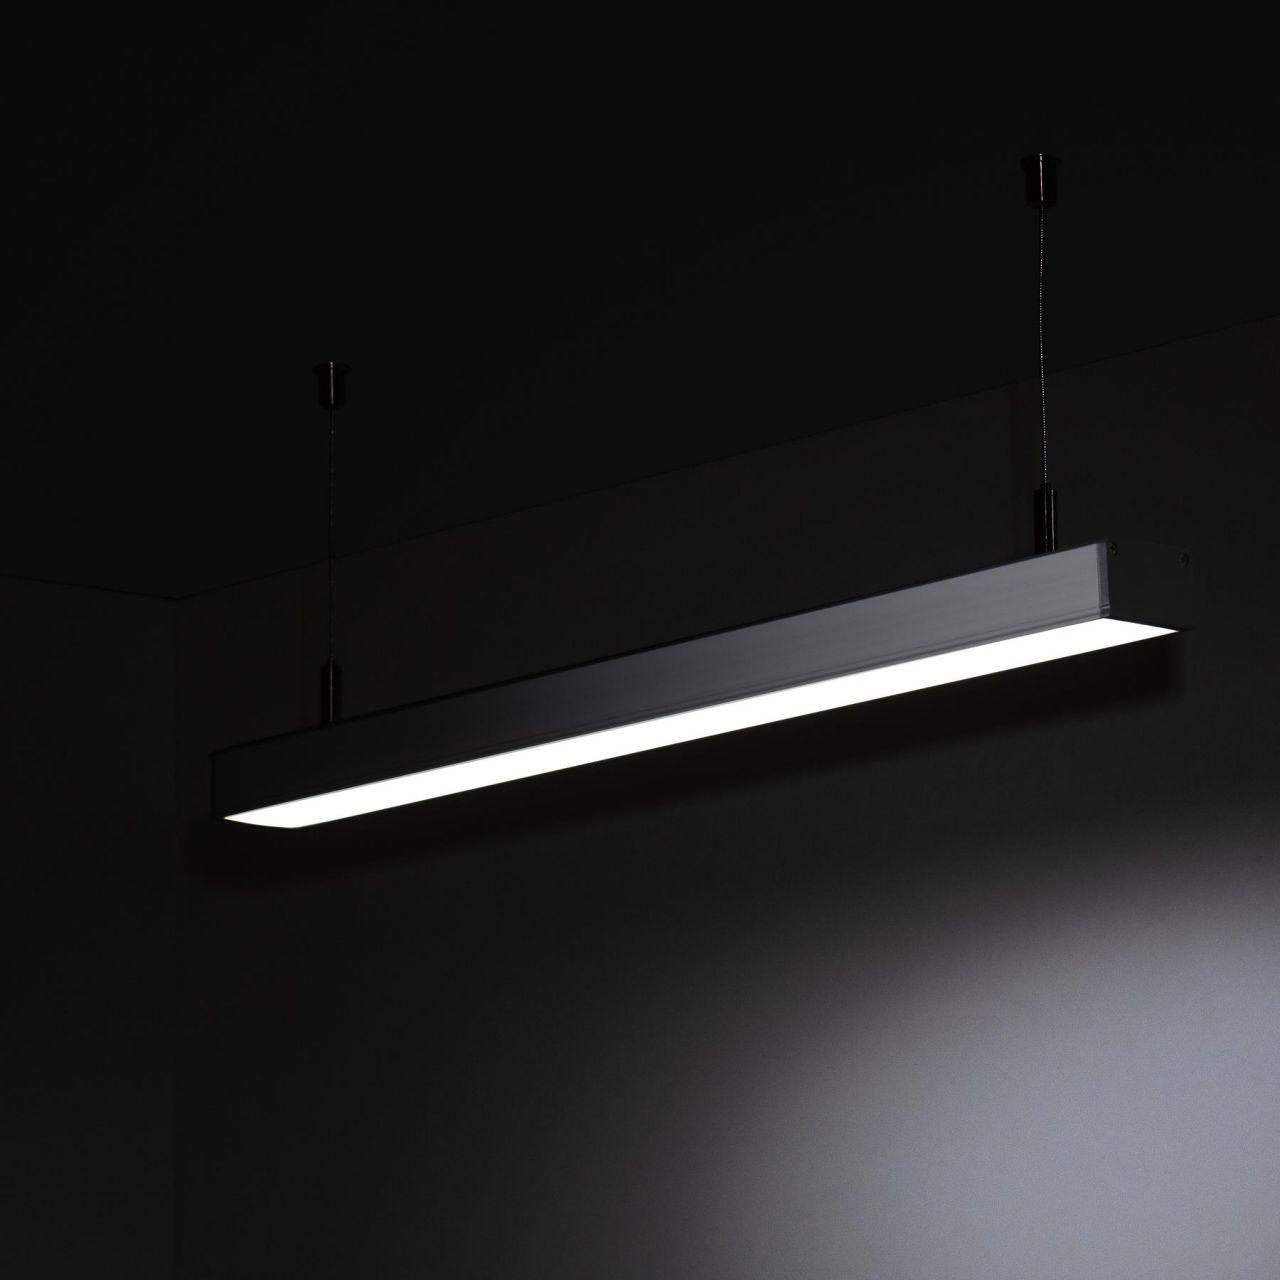 24V Aluminium LED Pendelleuchte – weiß – linear – diffuse Abdeckung